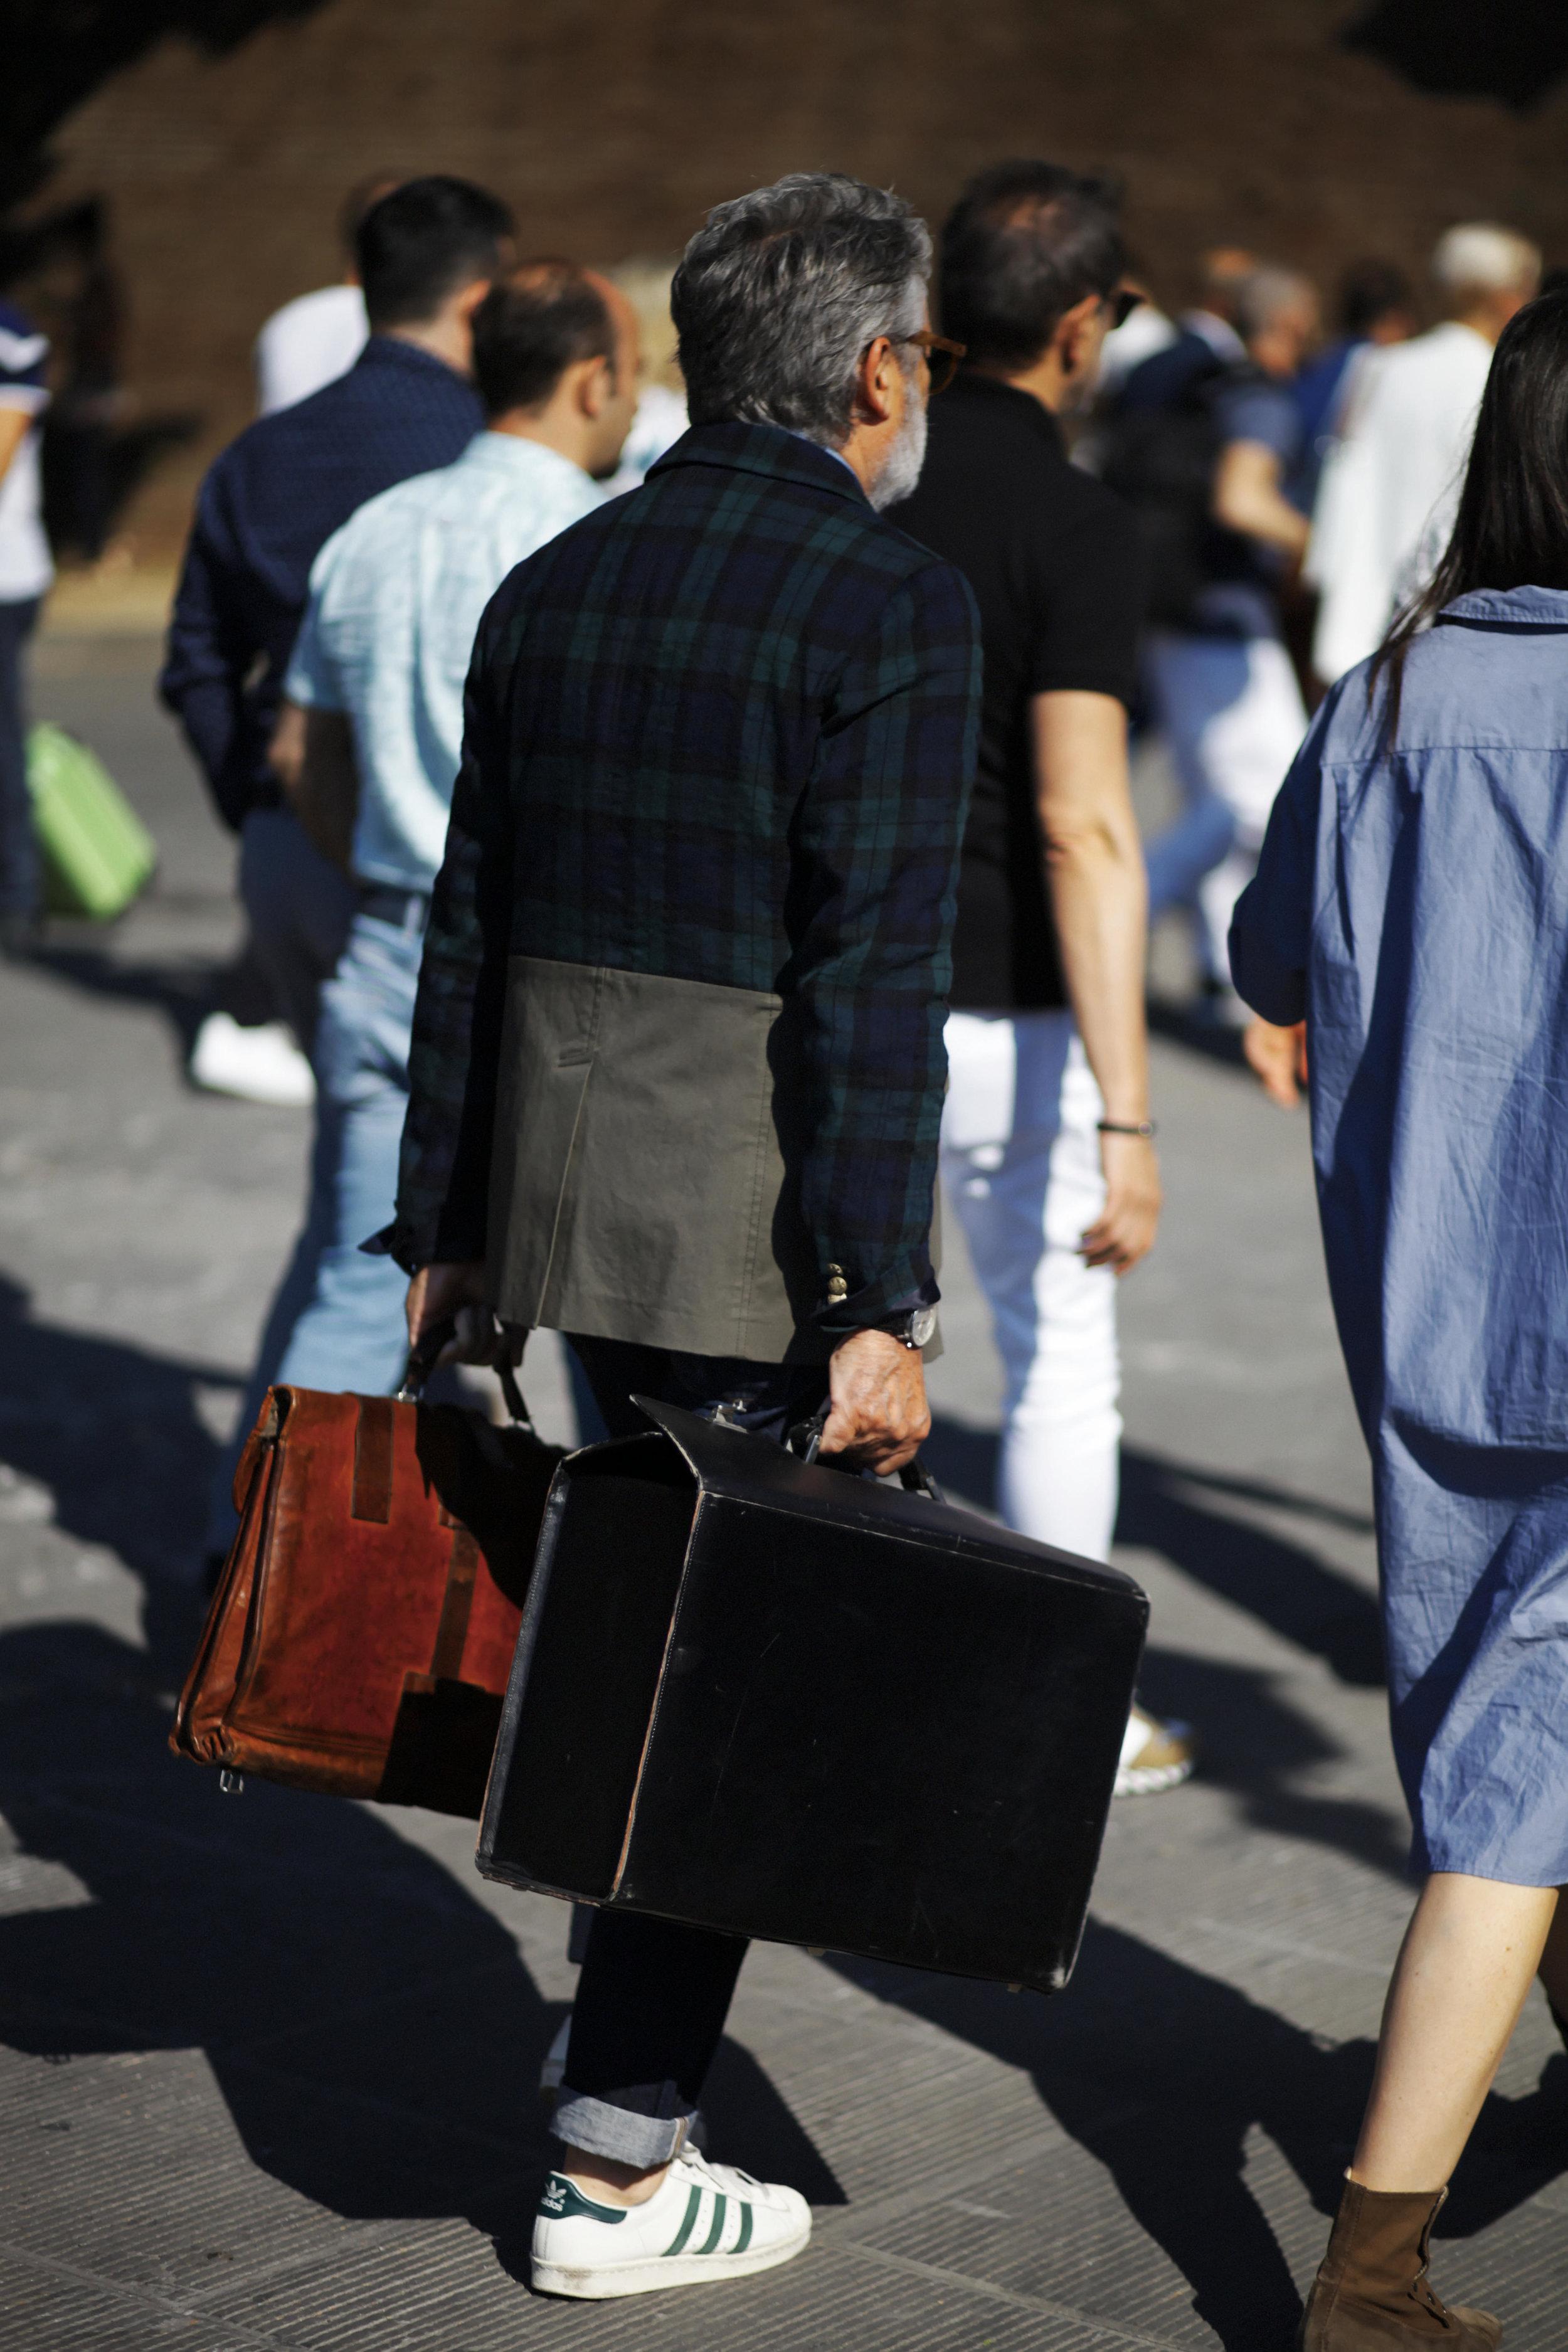 Pitti Uomo les indispensables paris 92 Florence sac bag valise